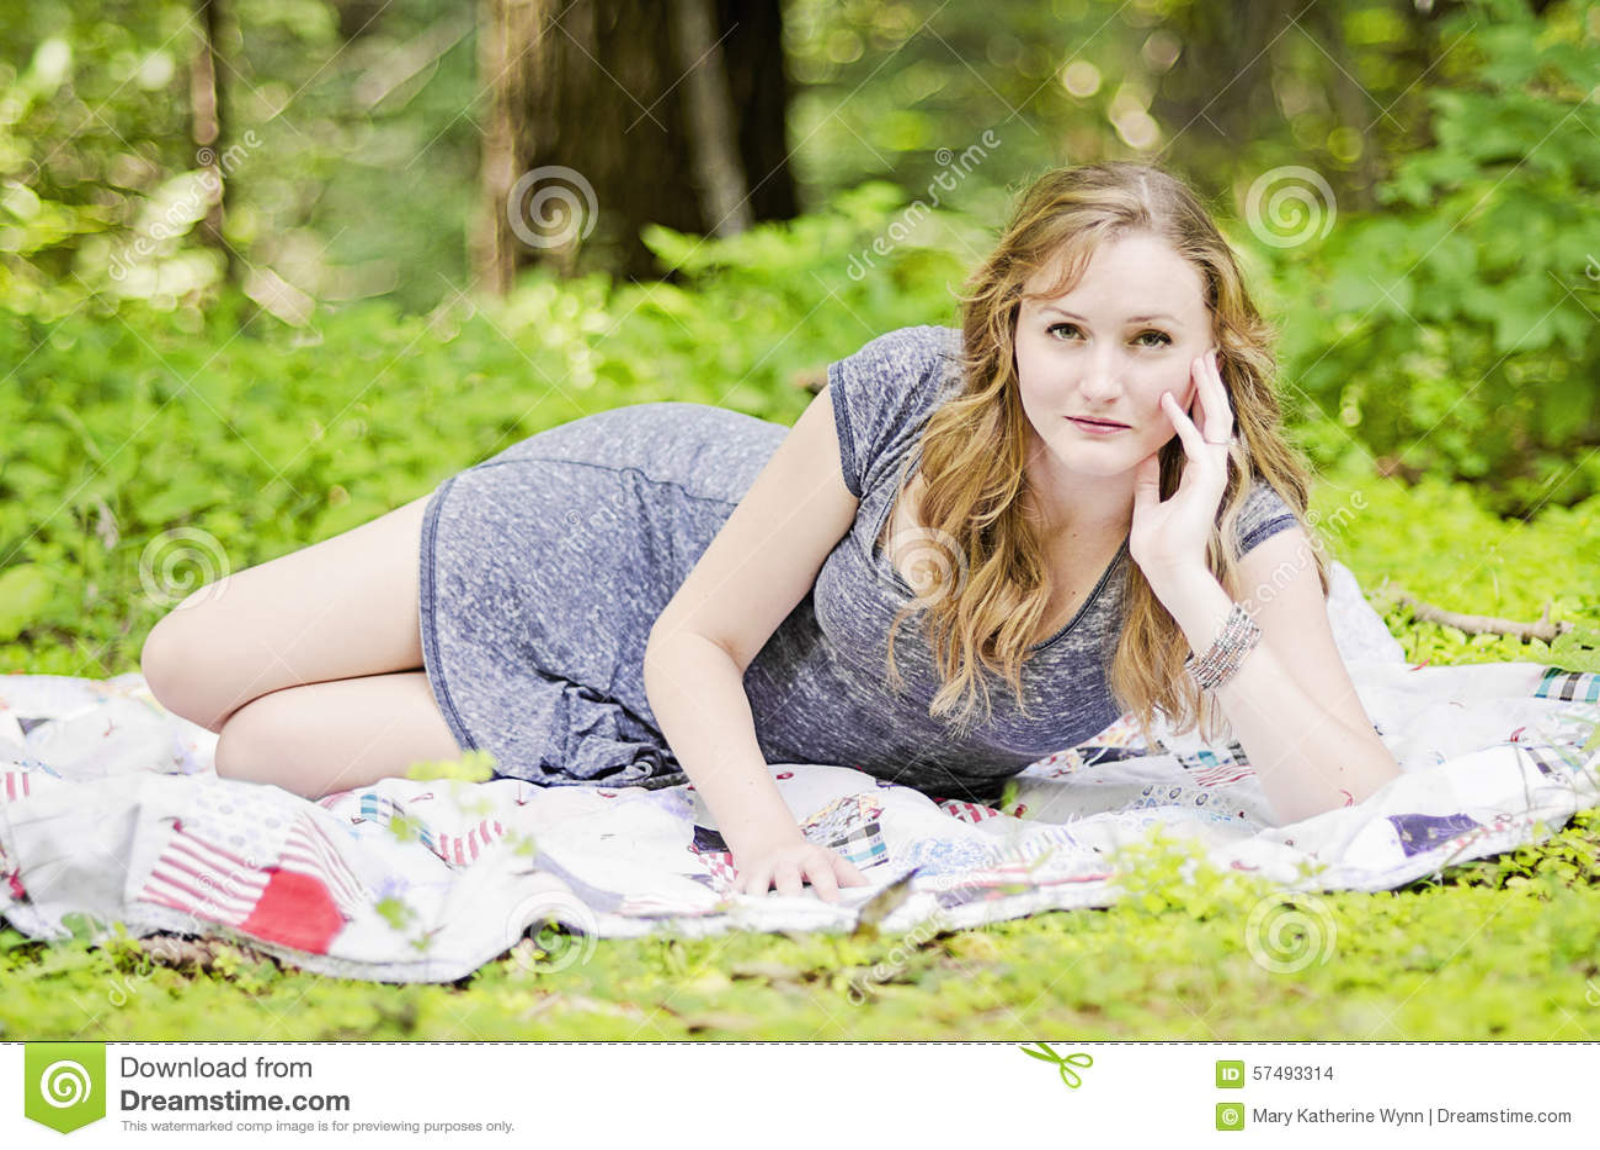 Woman on picnic blanket